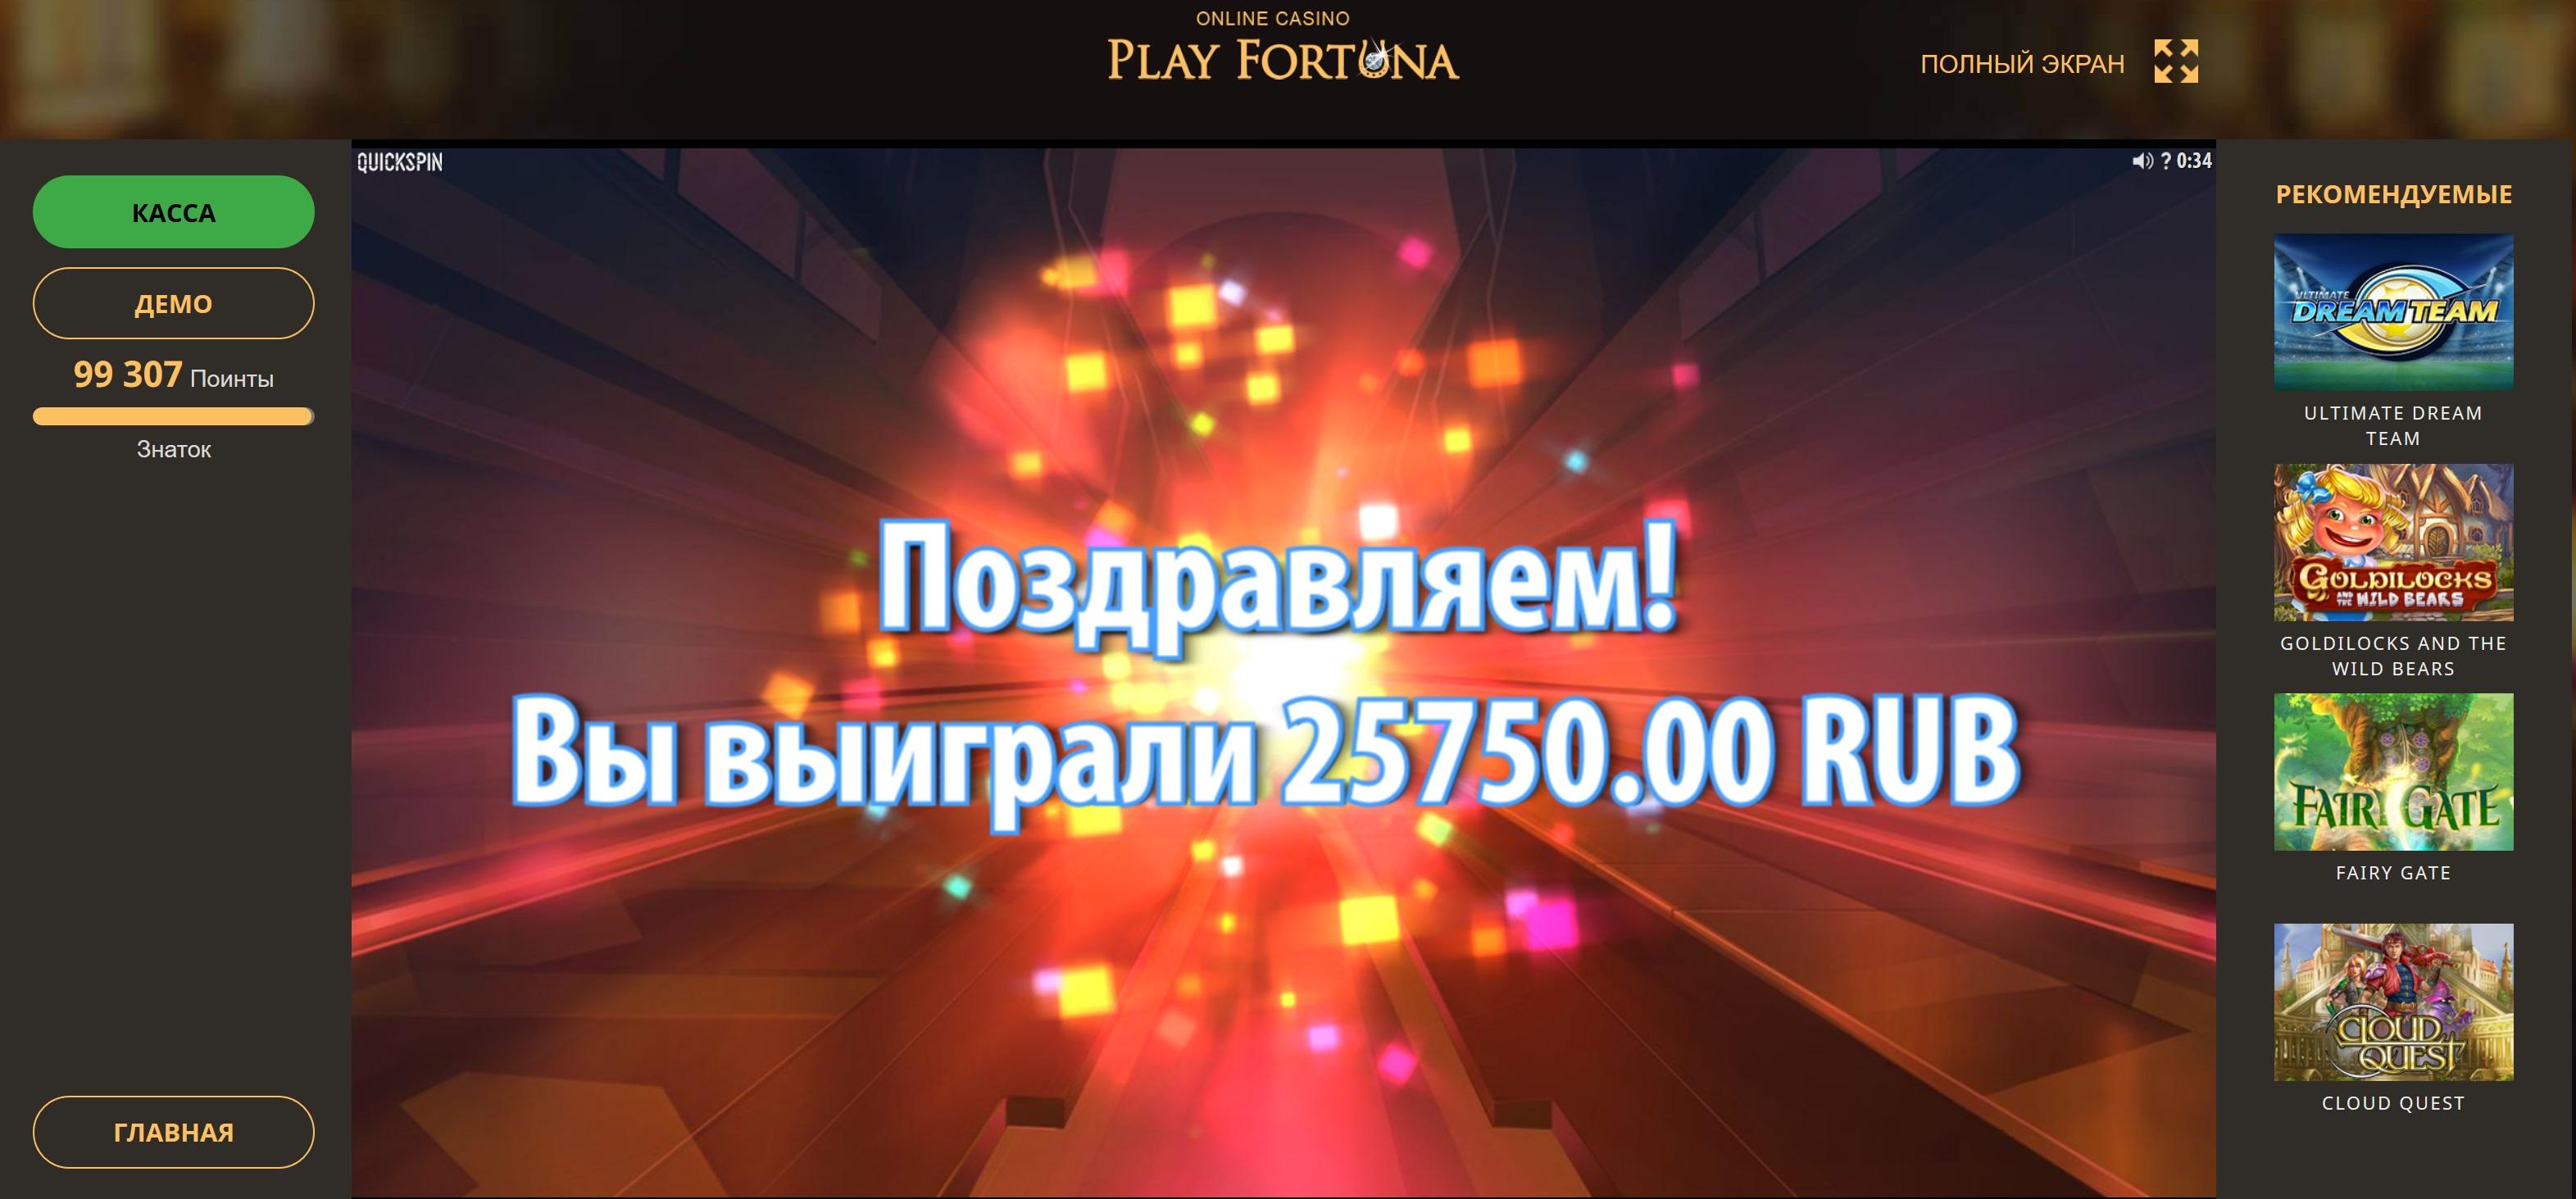 казино фортуна вход